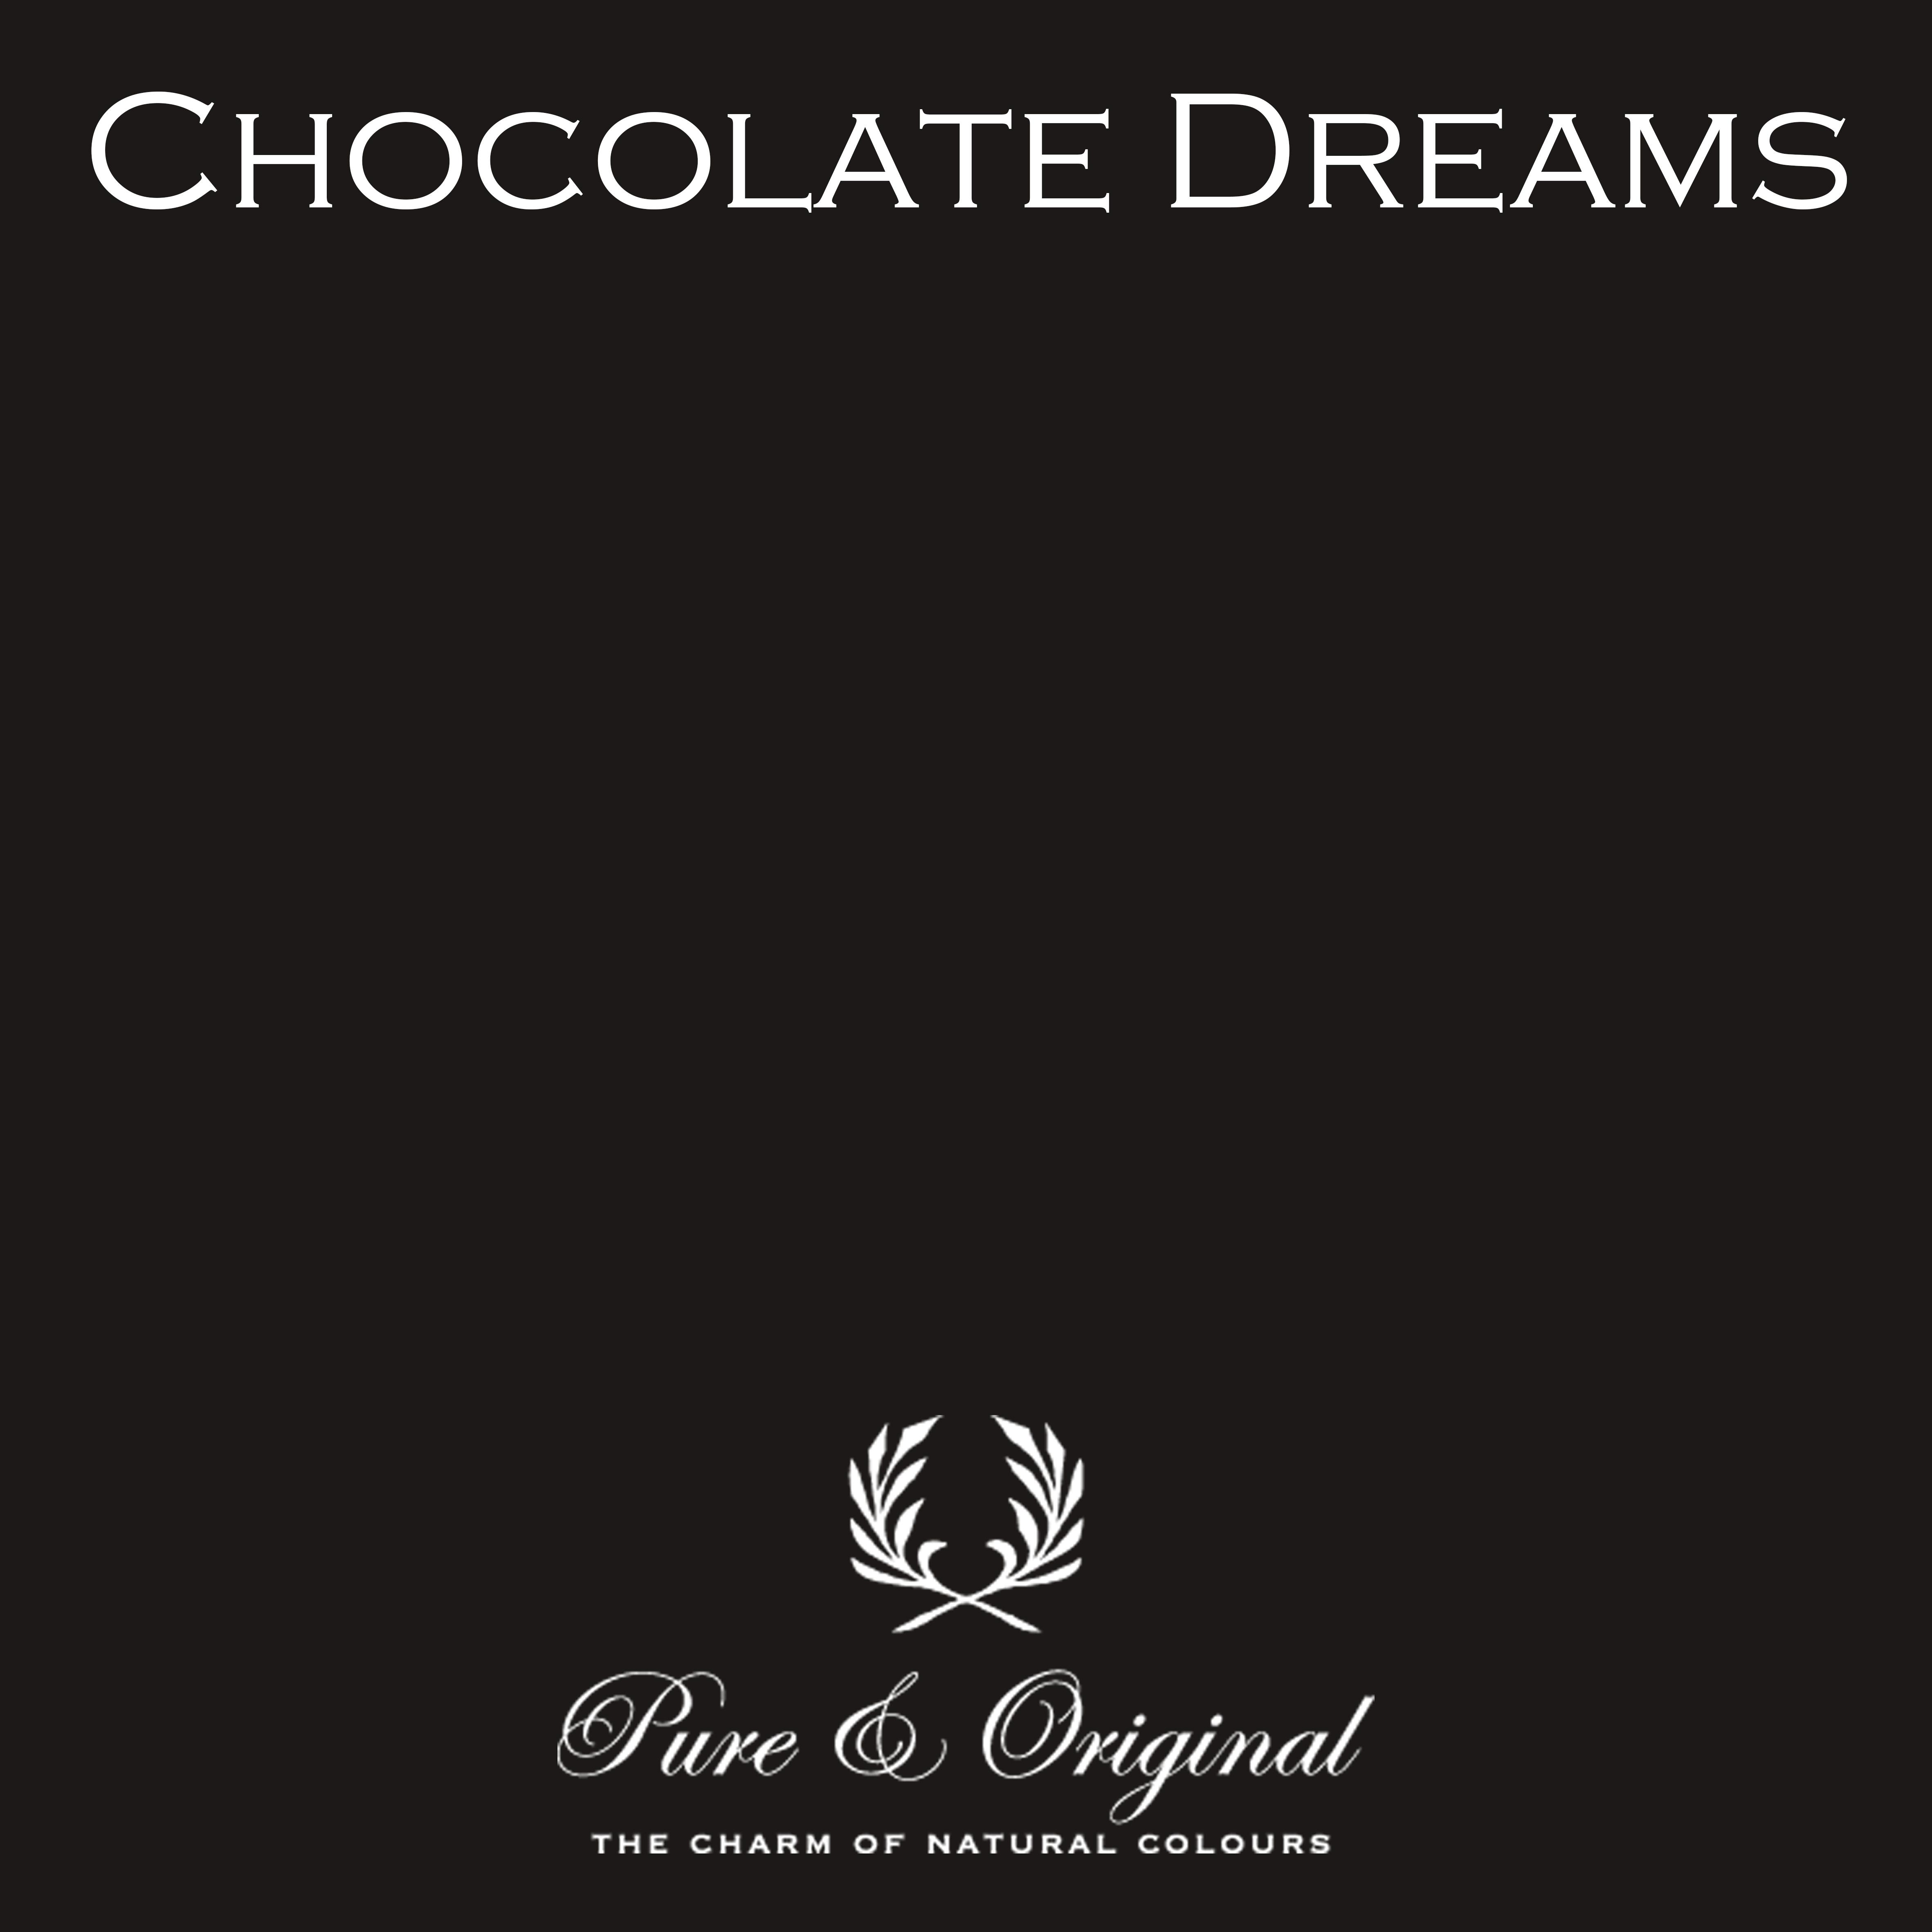 Kulör Chocolate Dreams, Classico kritfärg